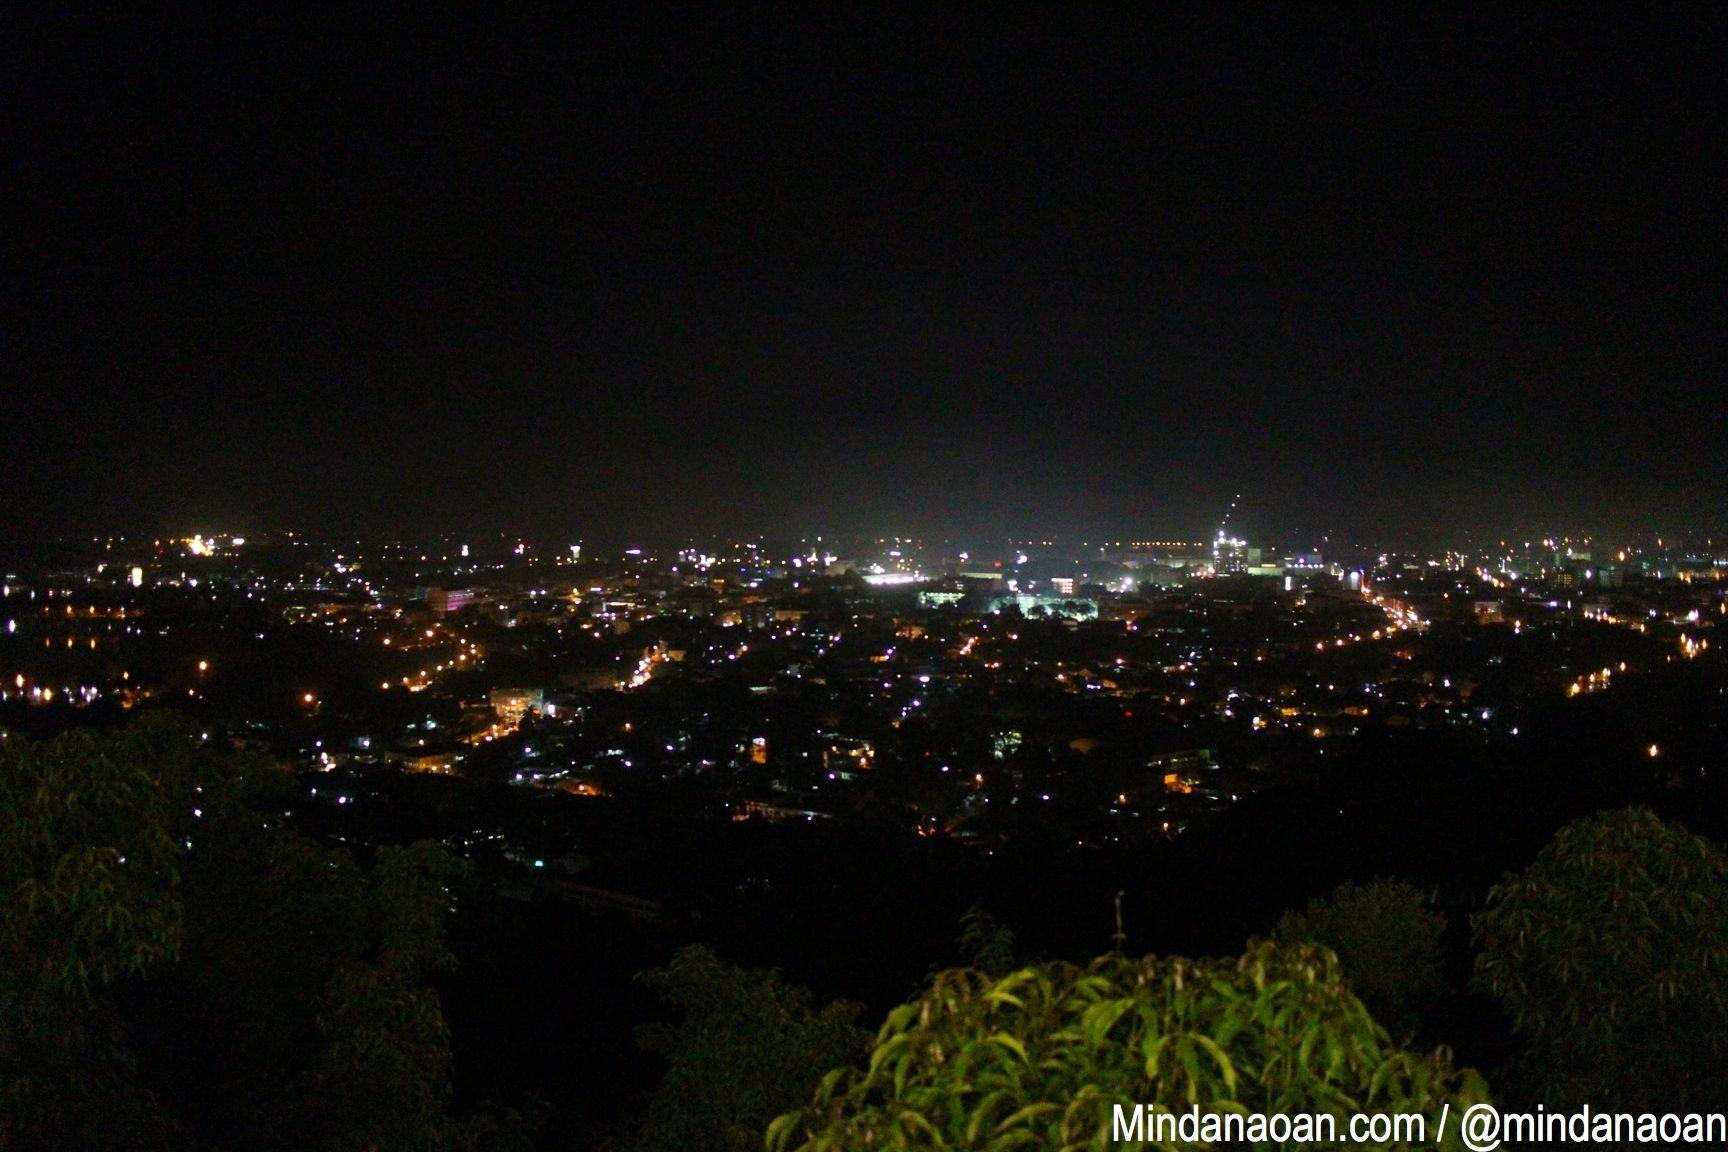 Review: High Ridge overlooking CDO Philippines